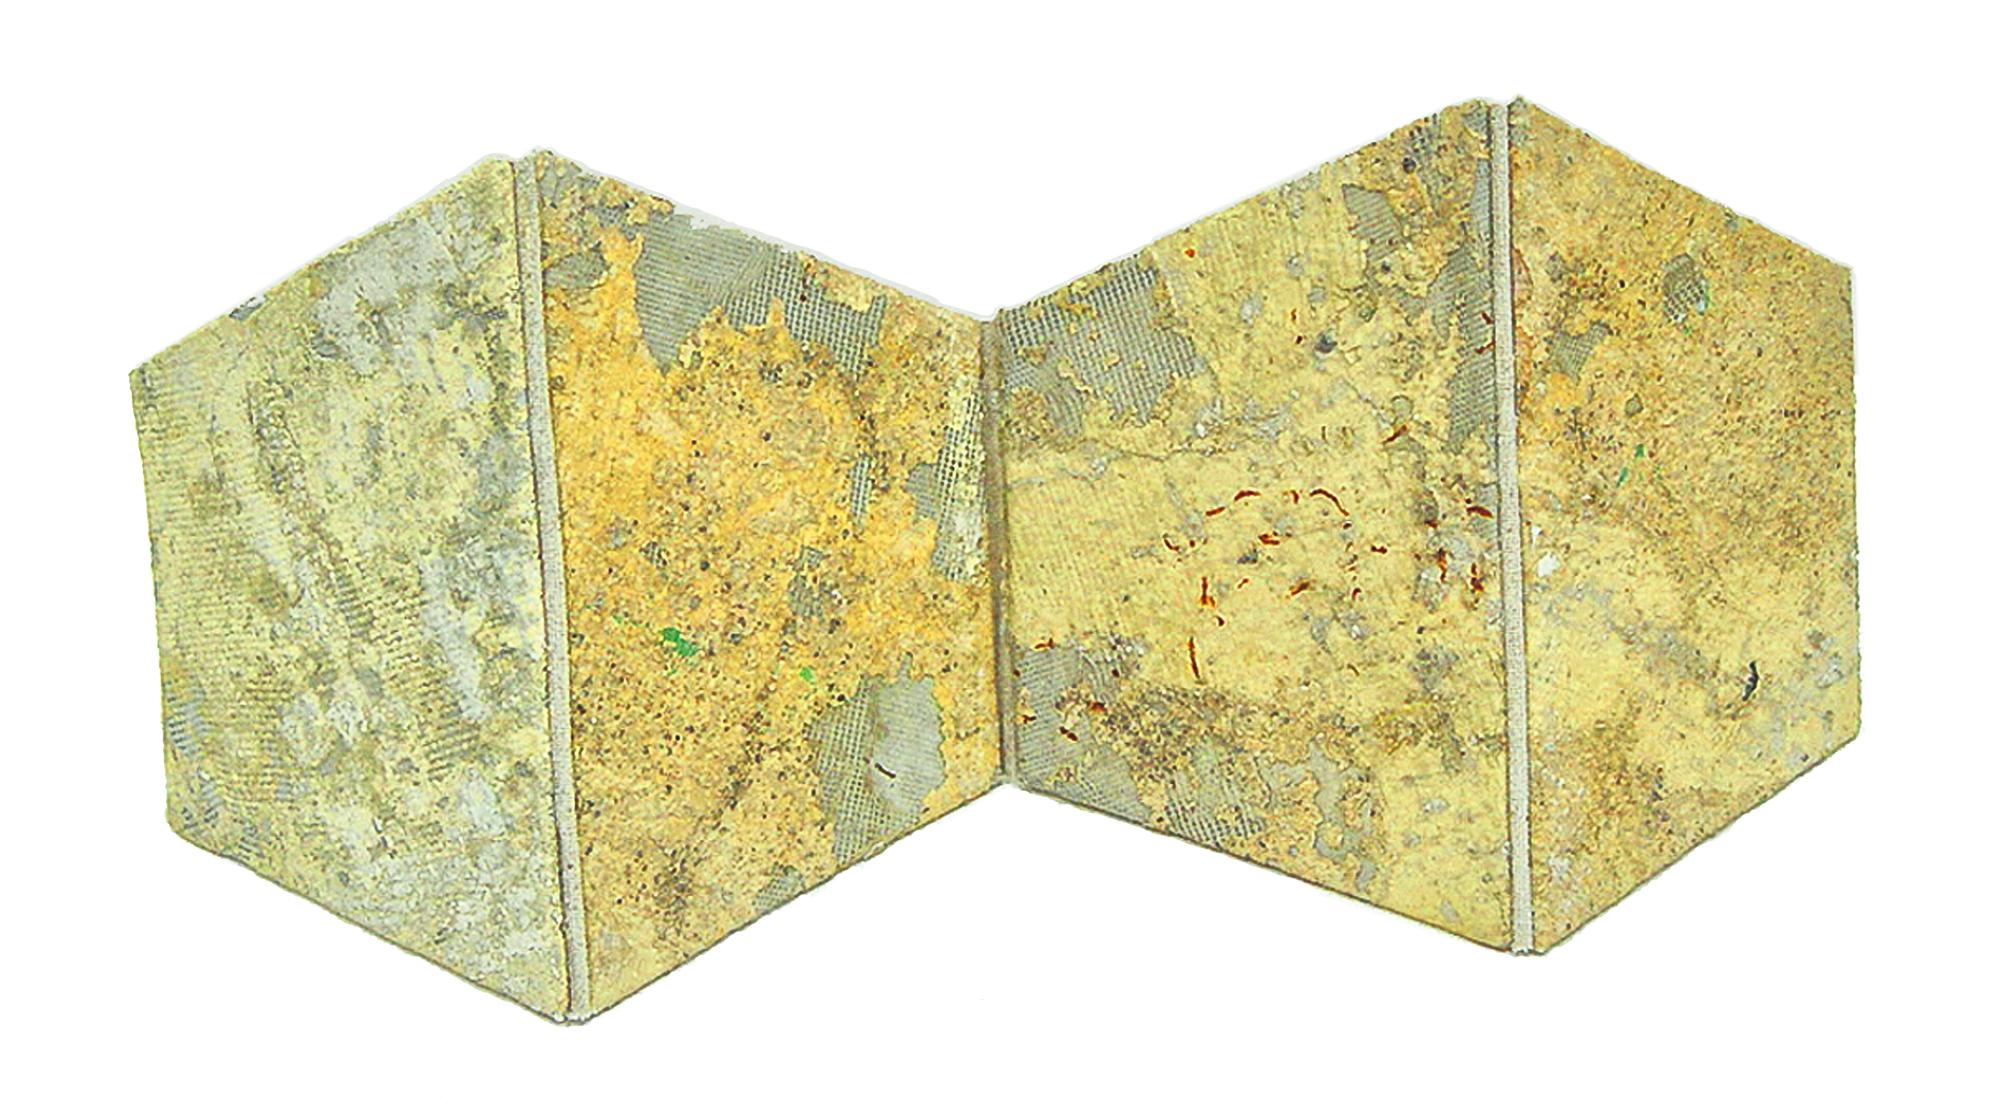 Magnolia Soto. Diorama. Topofilia interior. Técnica mixta. 18,5 cm. x 51.5 cm x 2cm. 1998.